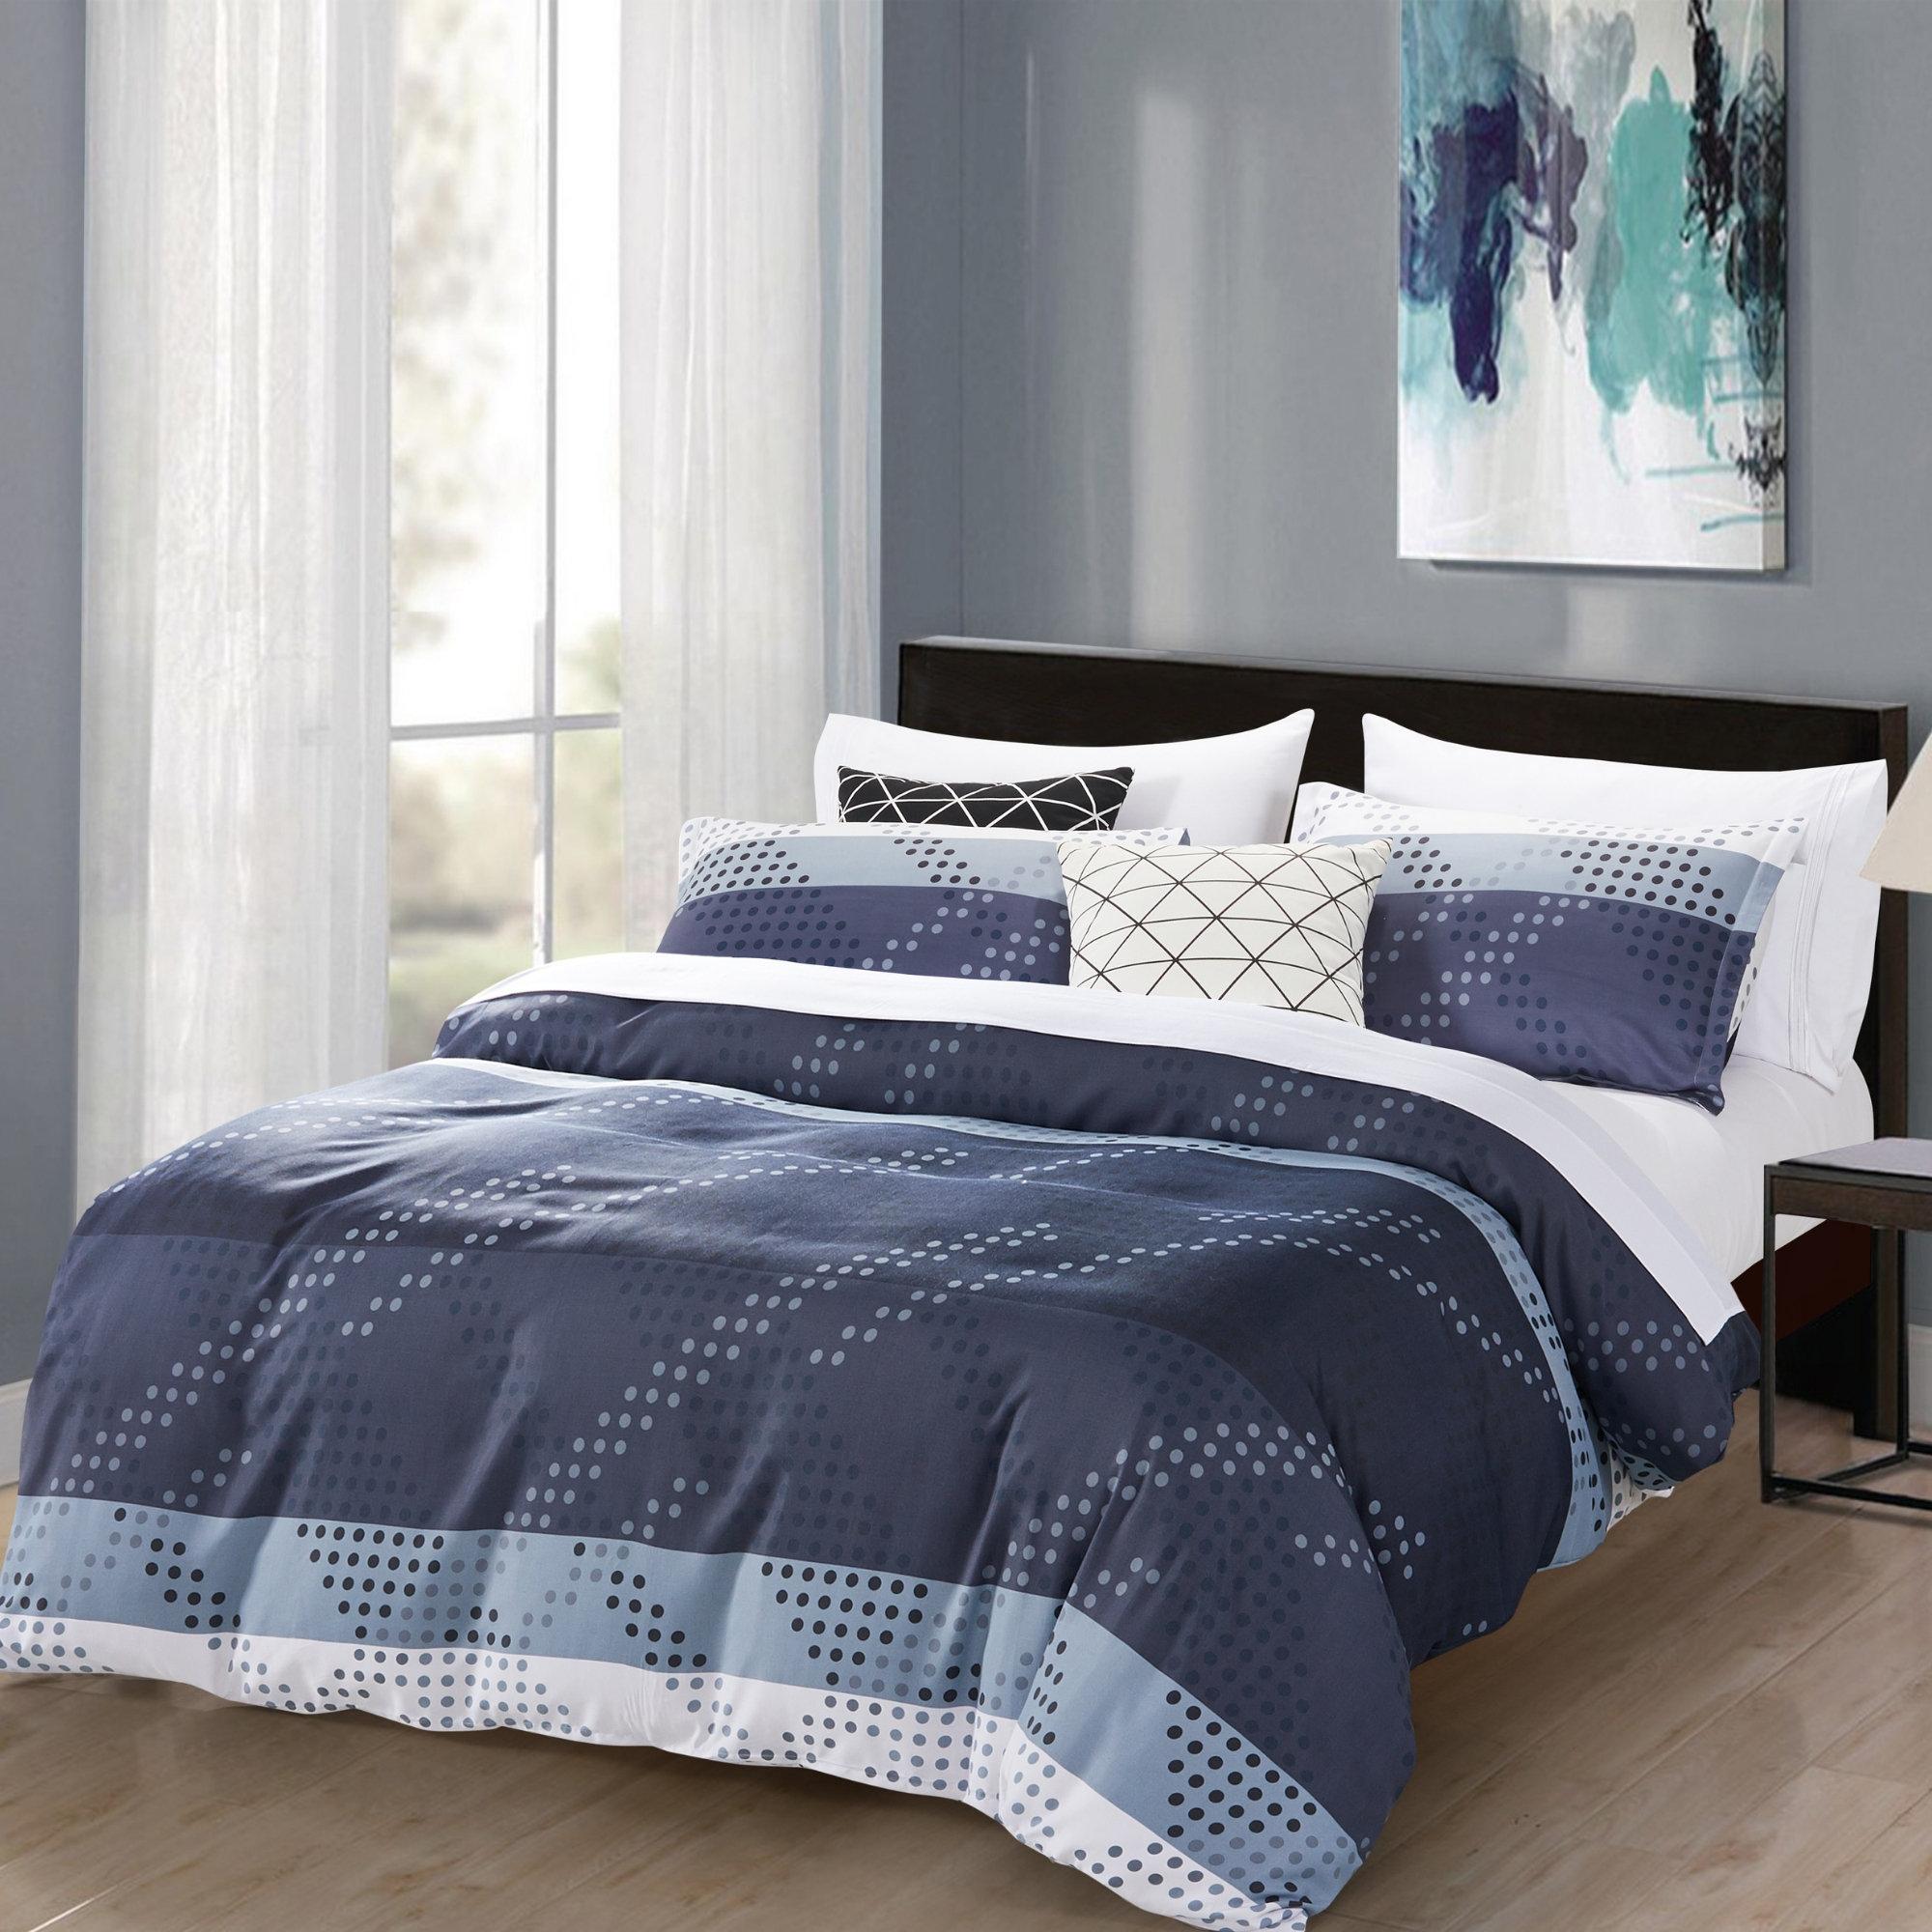 7febb06e01 Ebern Designs Steyning Monochromatic 3 Piece Duvet Cover Set | Wayfair